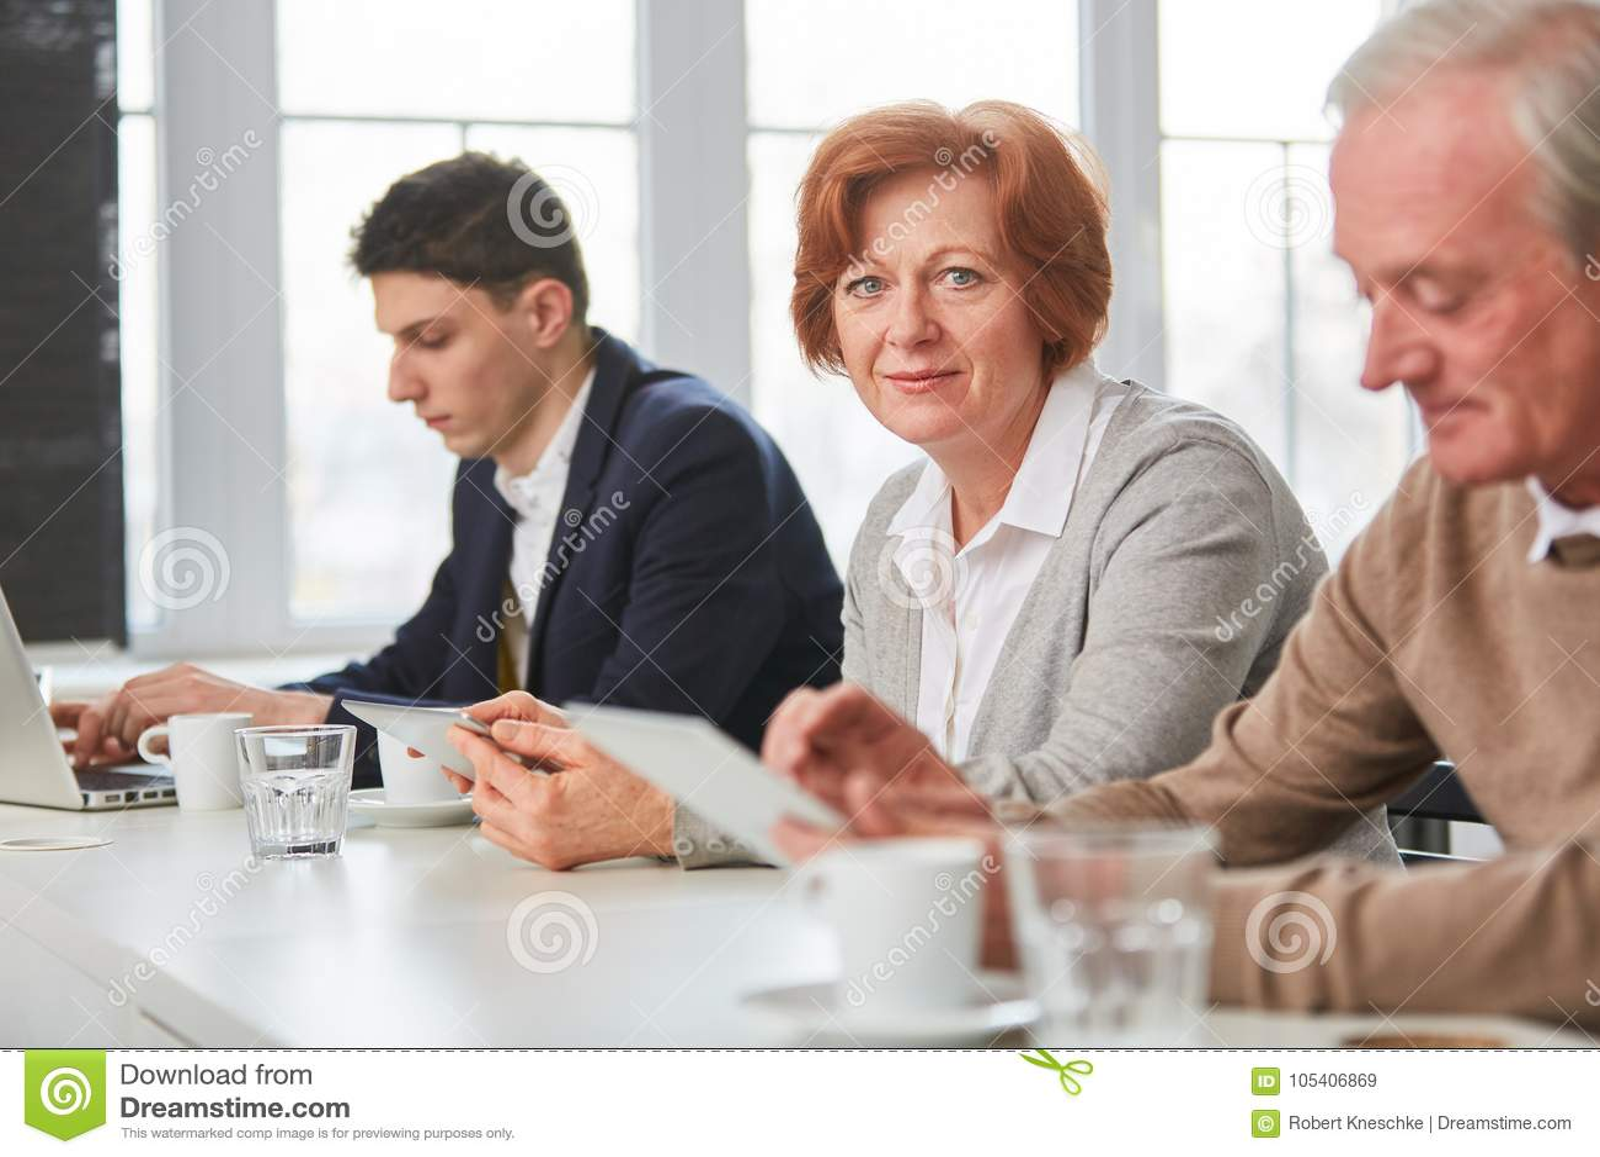 Senior Meeting People Com